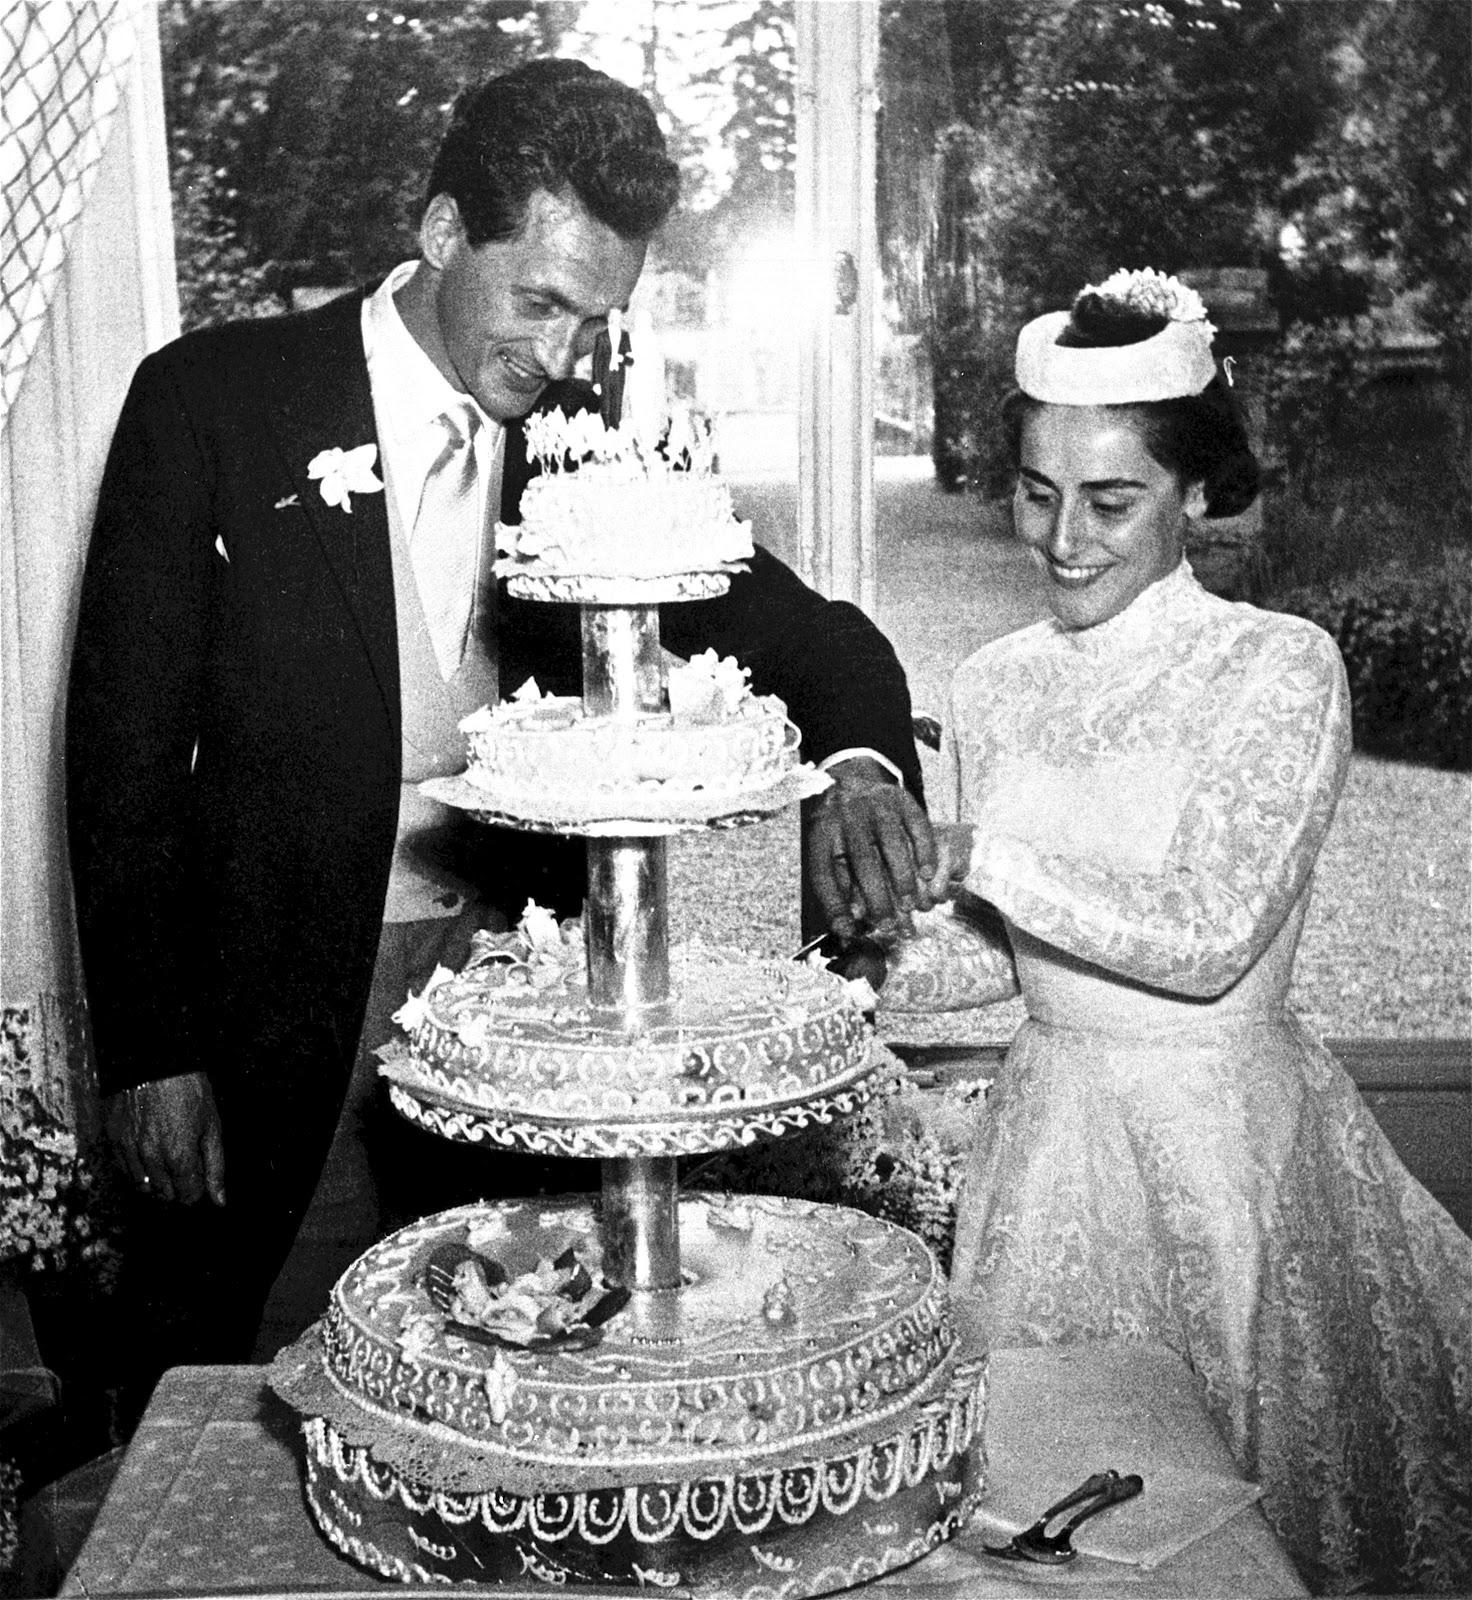 Ottavio+e+Rosita+Missoni,+18+aprile+1953